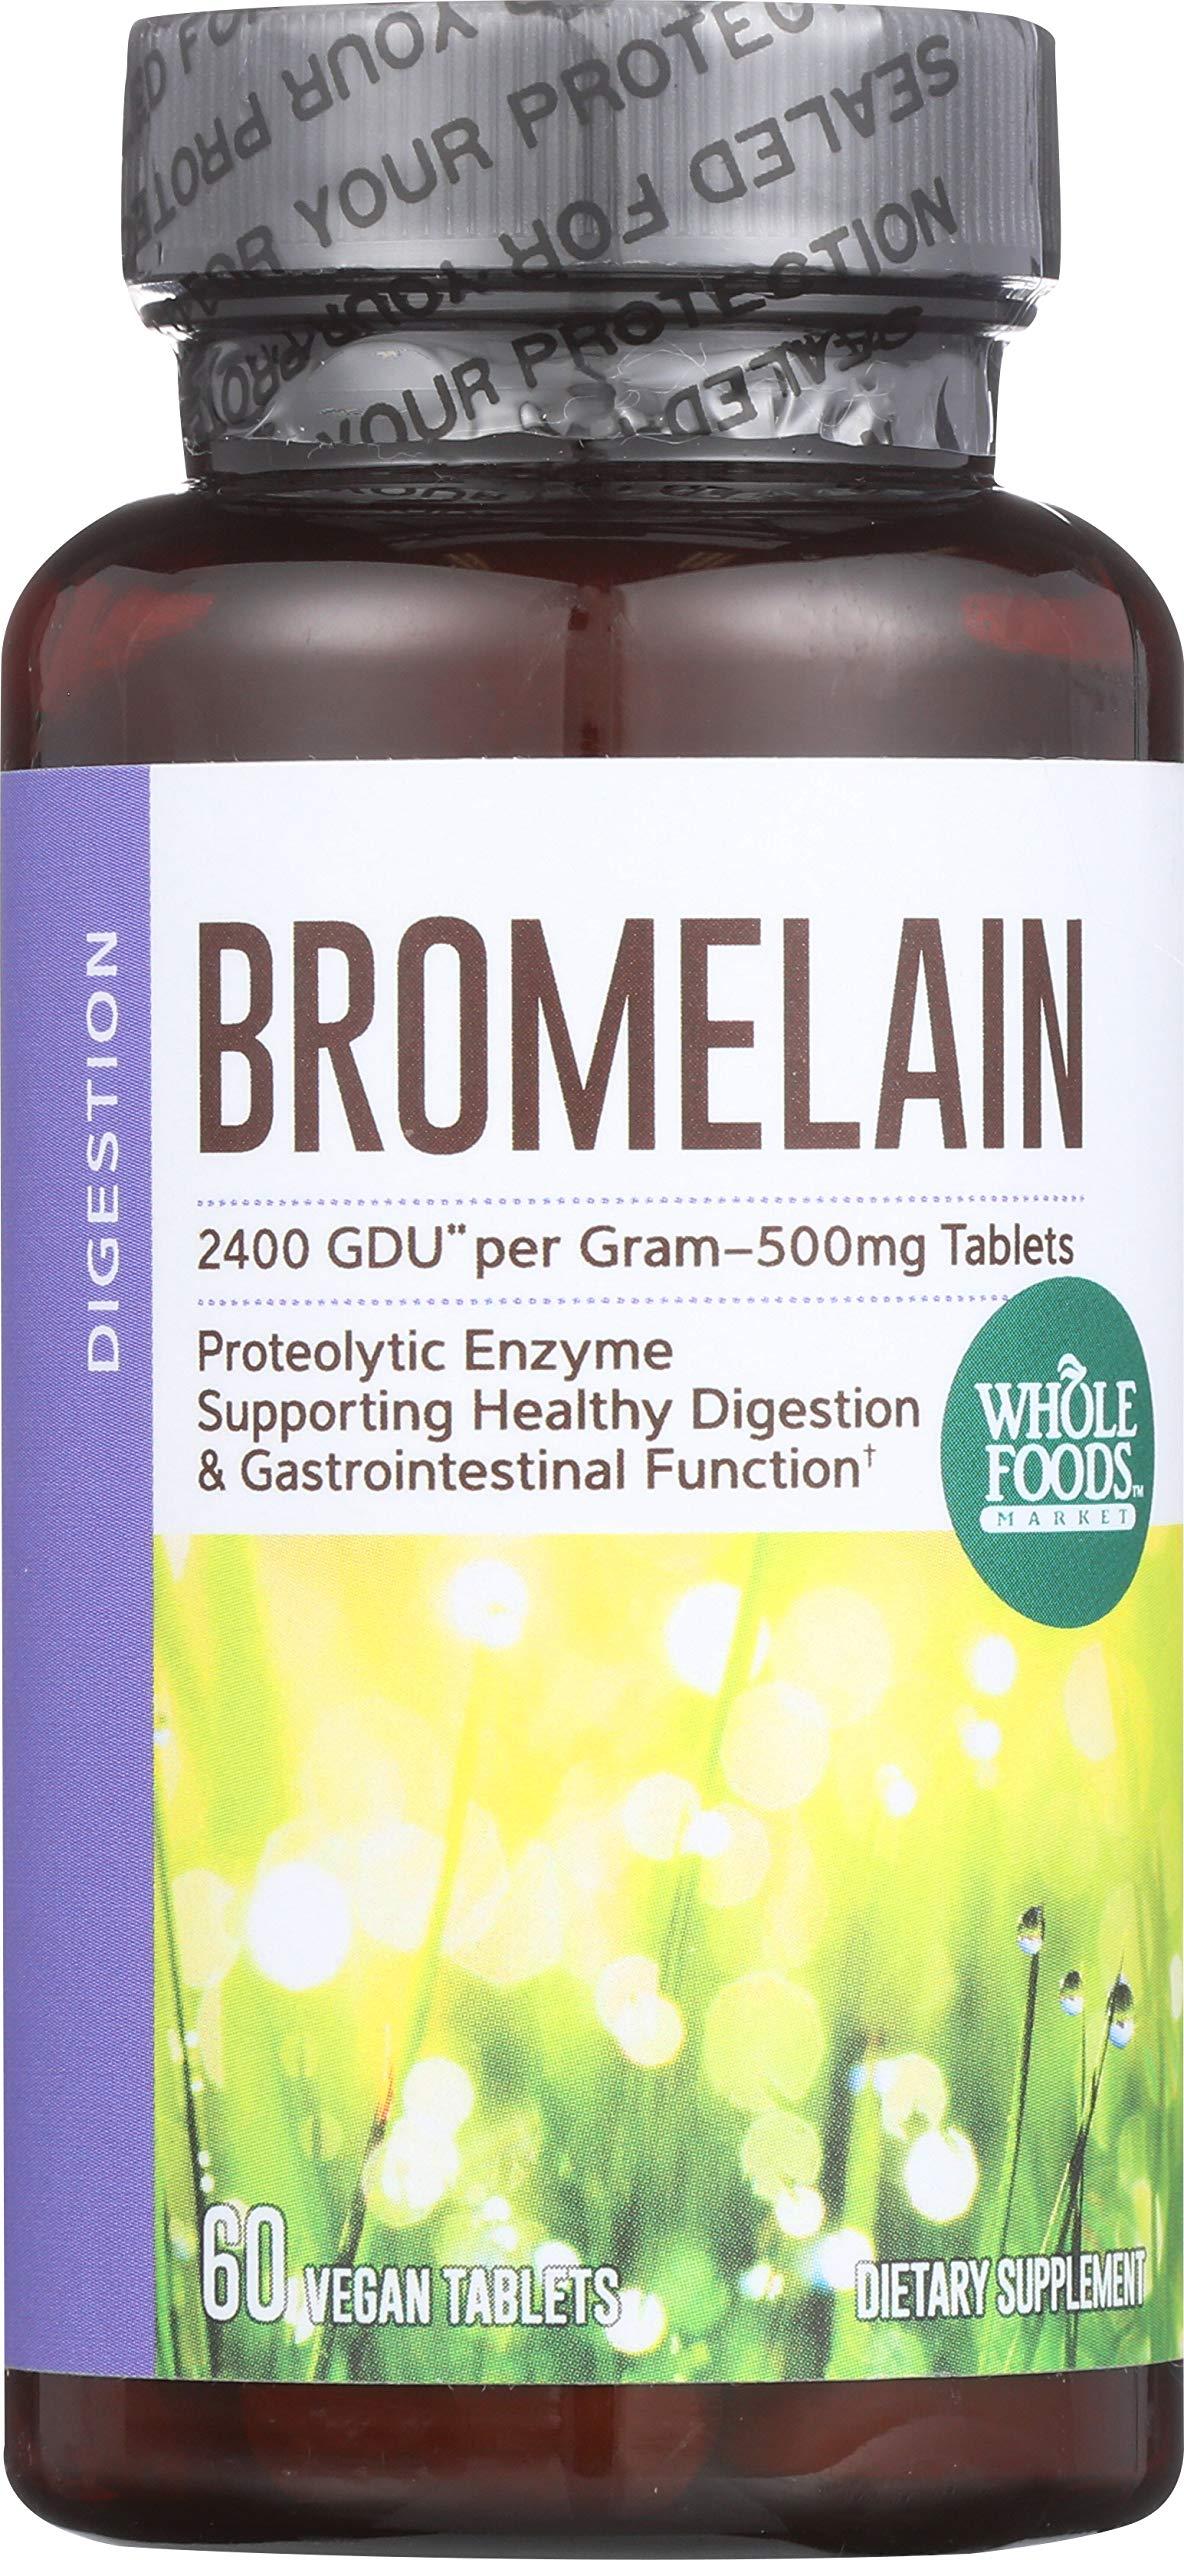 Whole Foods Market, Bromelain, 60 ct